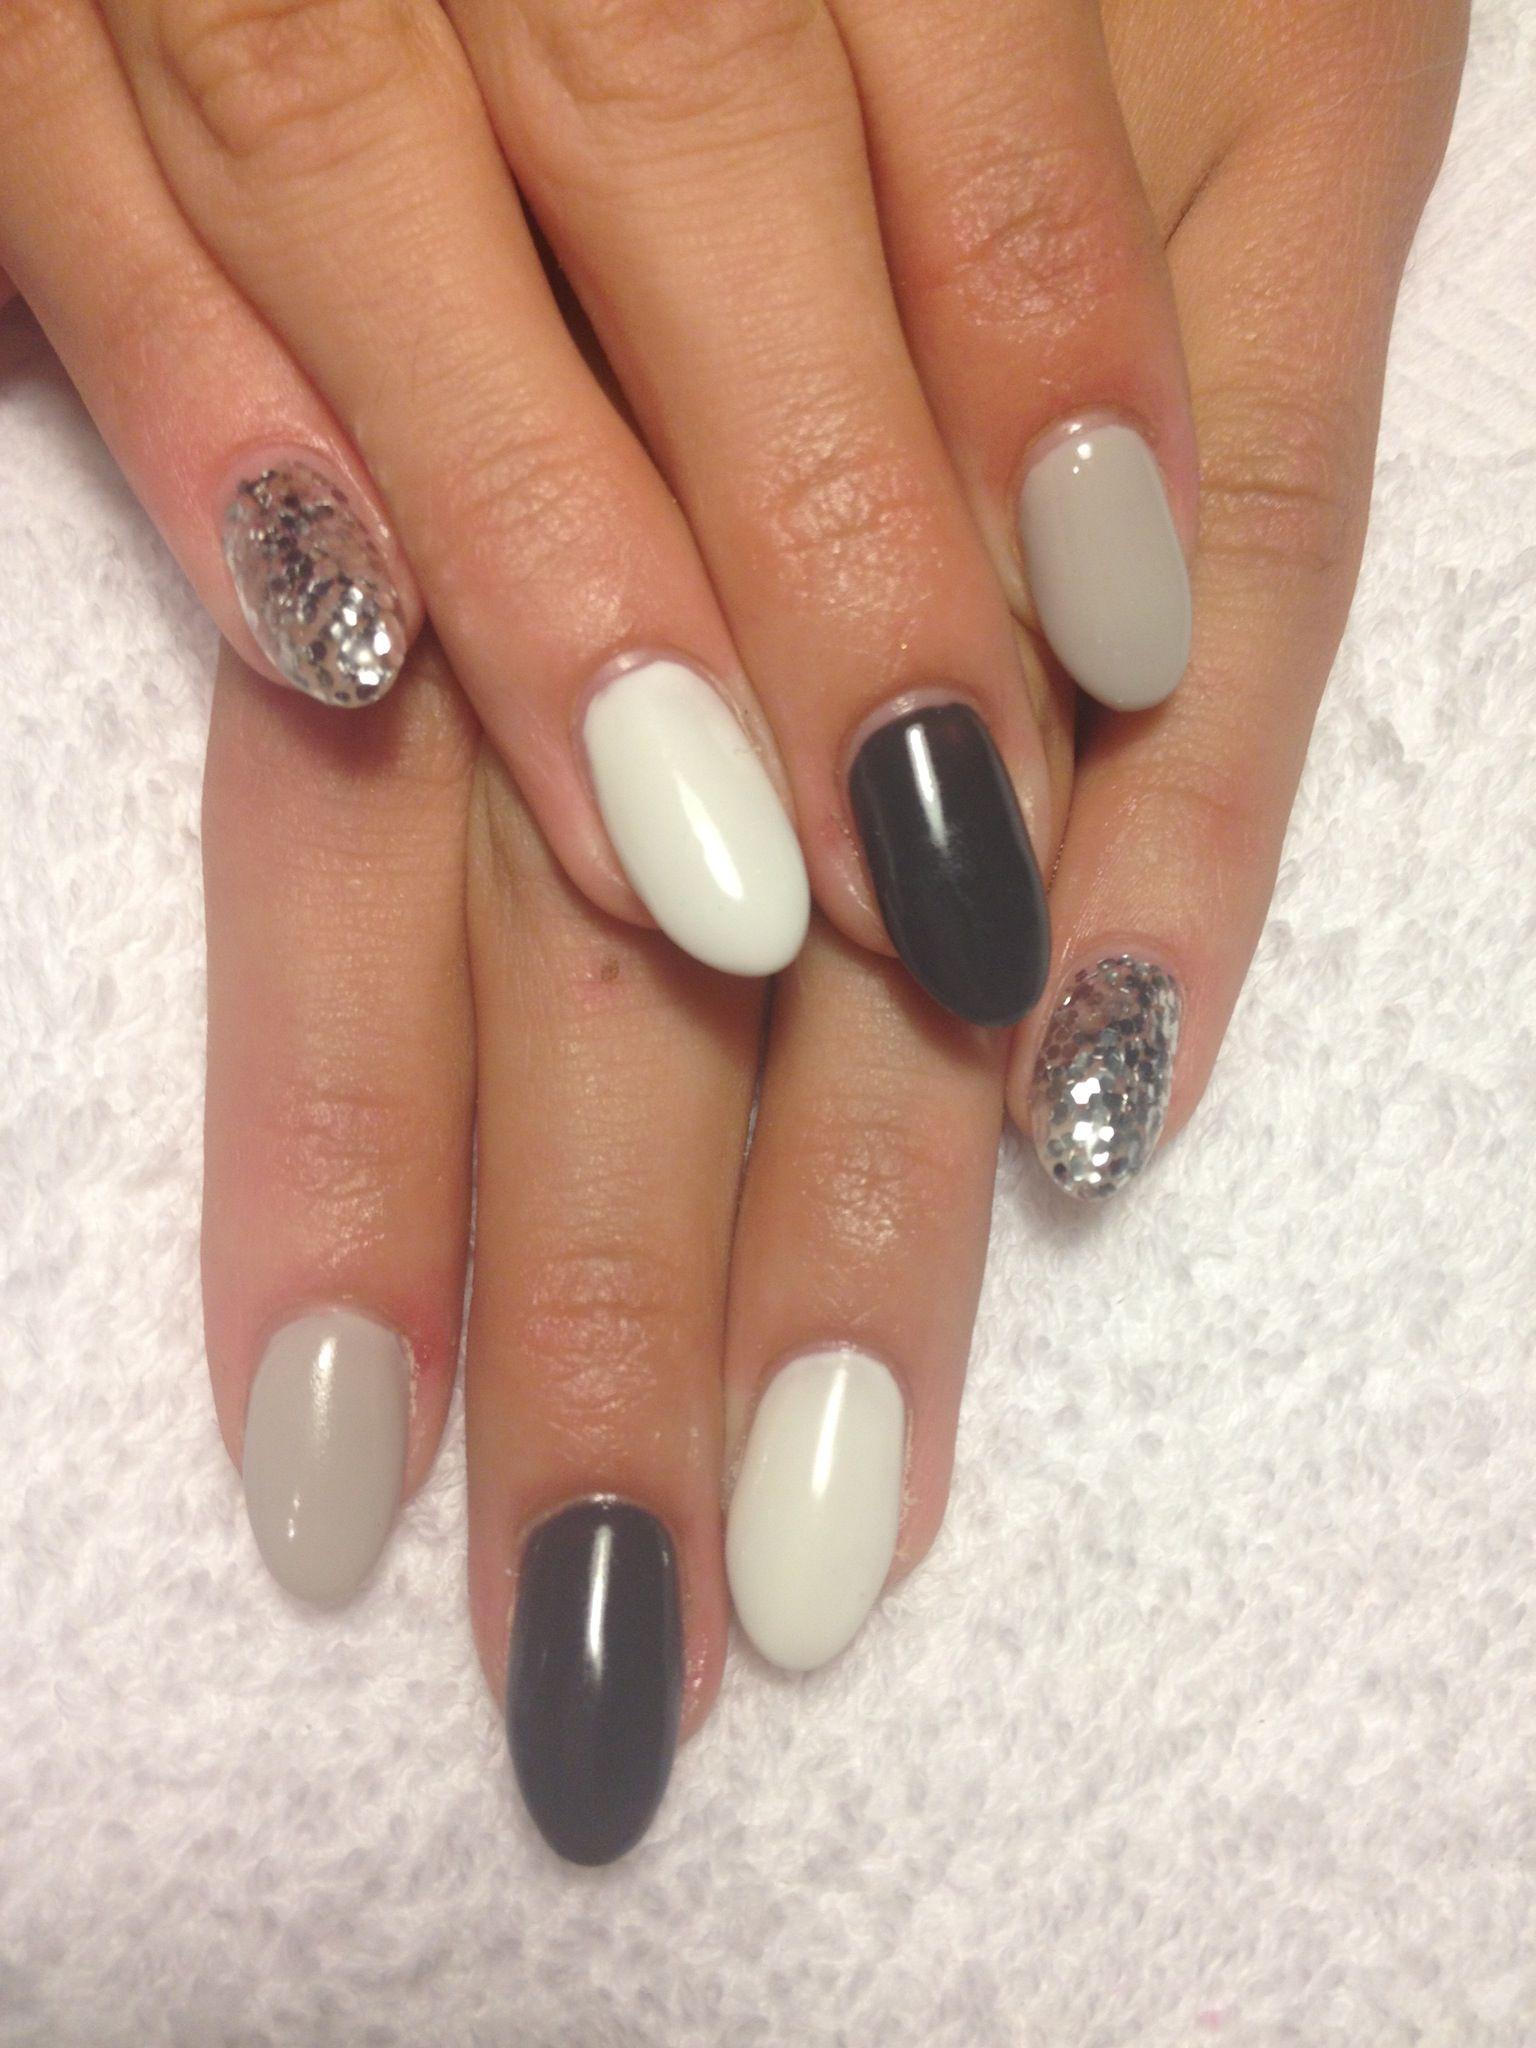 Gels Dark Grey Light Grey White Silver Glitter Oval Funky Nail Designs Glitter Gel Nails Nails